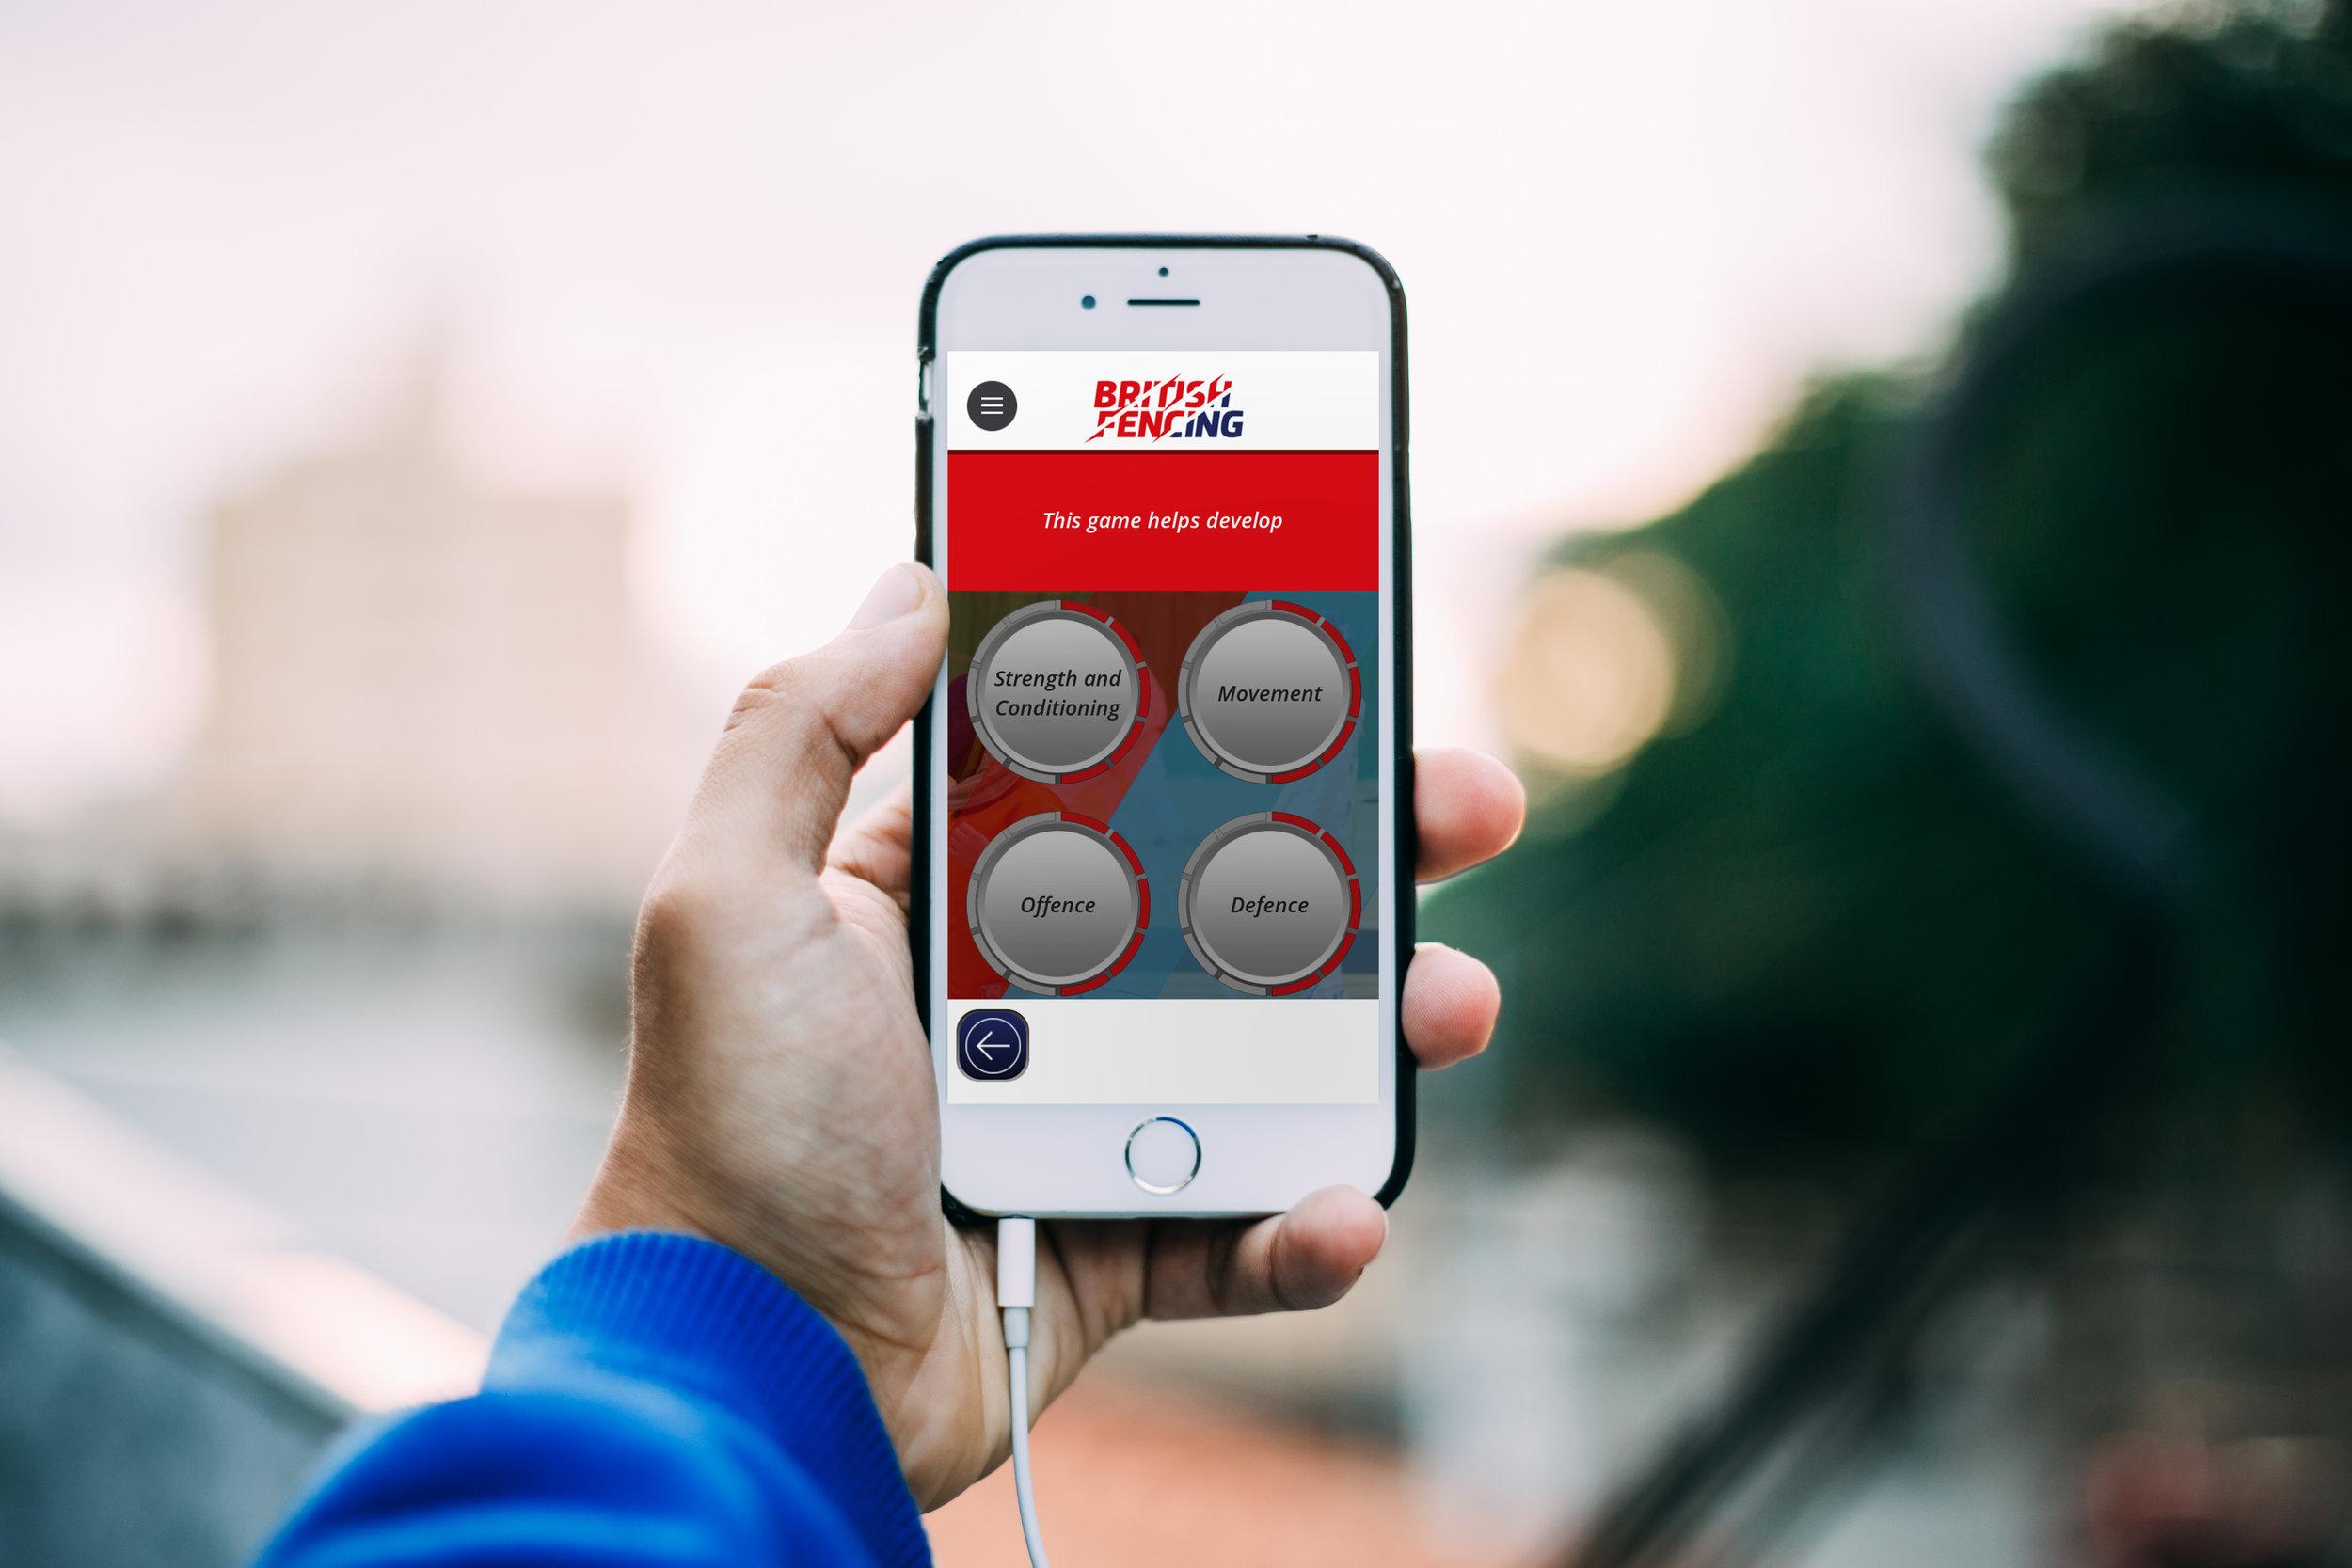 british-fencing-iphone-mockup.jpg